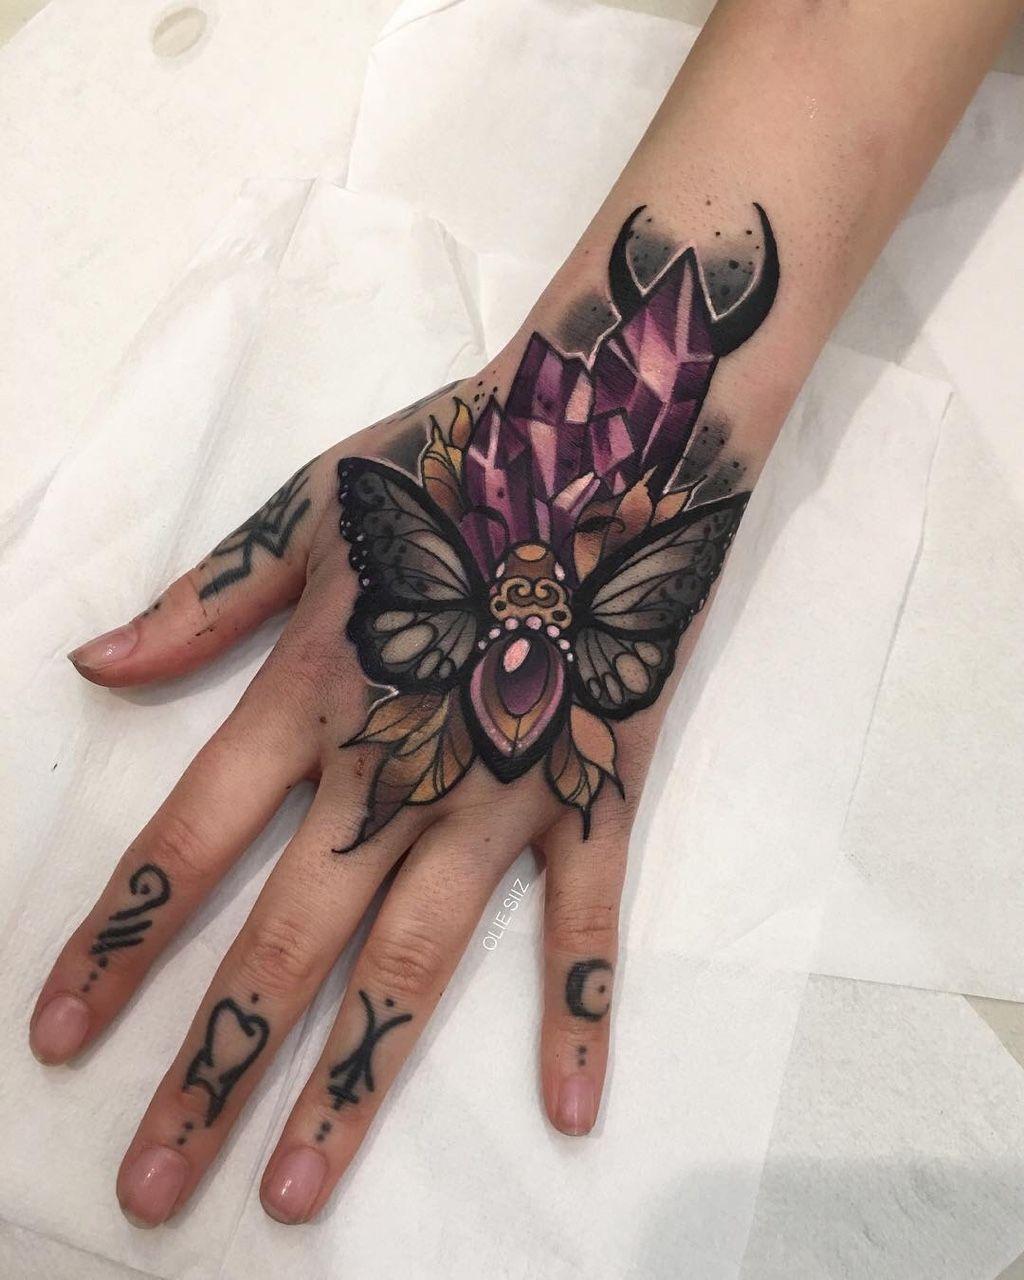 by Olie Siiz Not feeling the finger tats Jewel tattoo